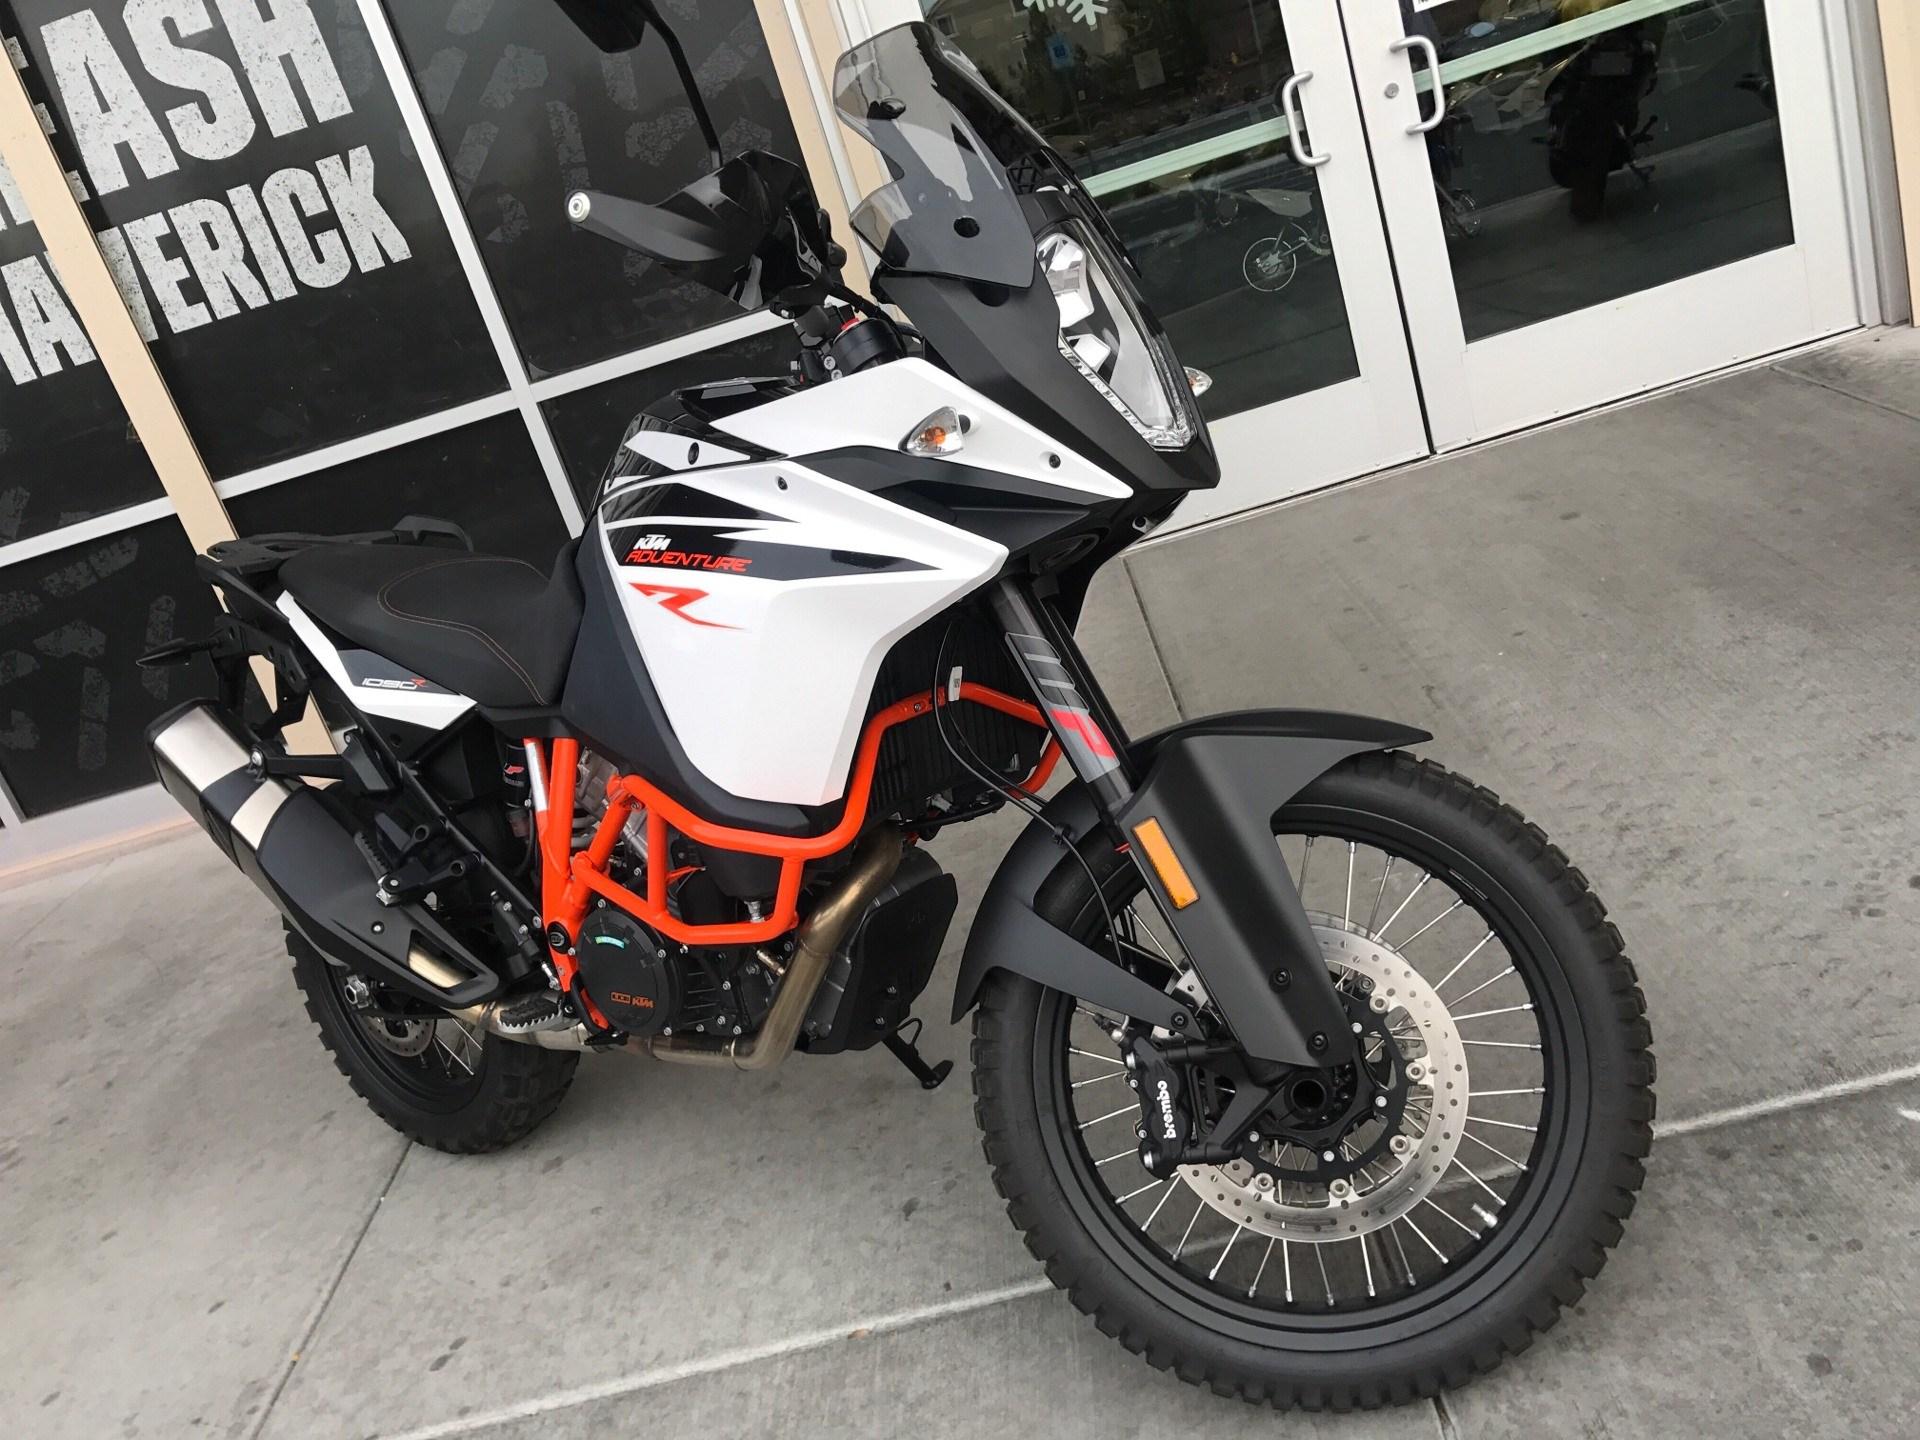 2018 KTM 1090 Adventure R for sale 5295